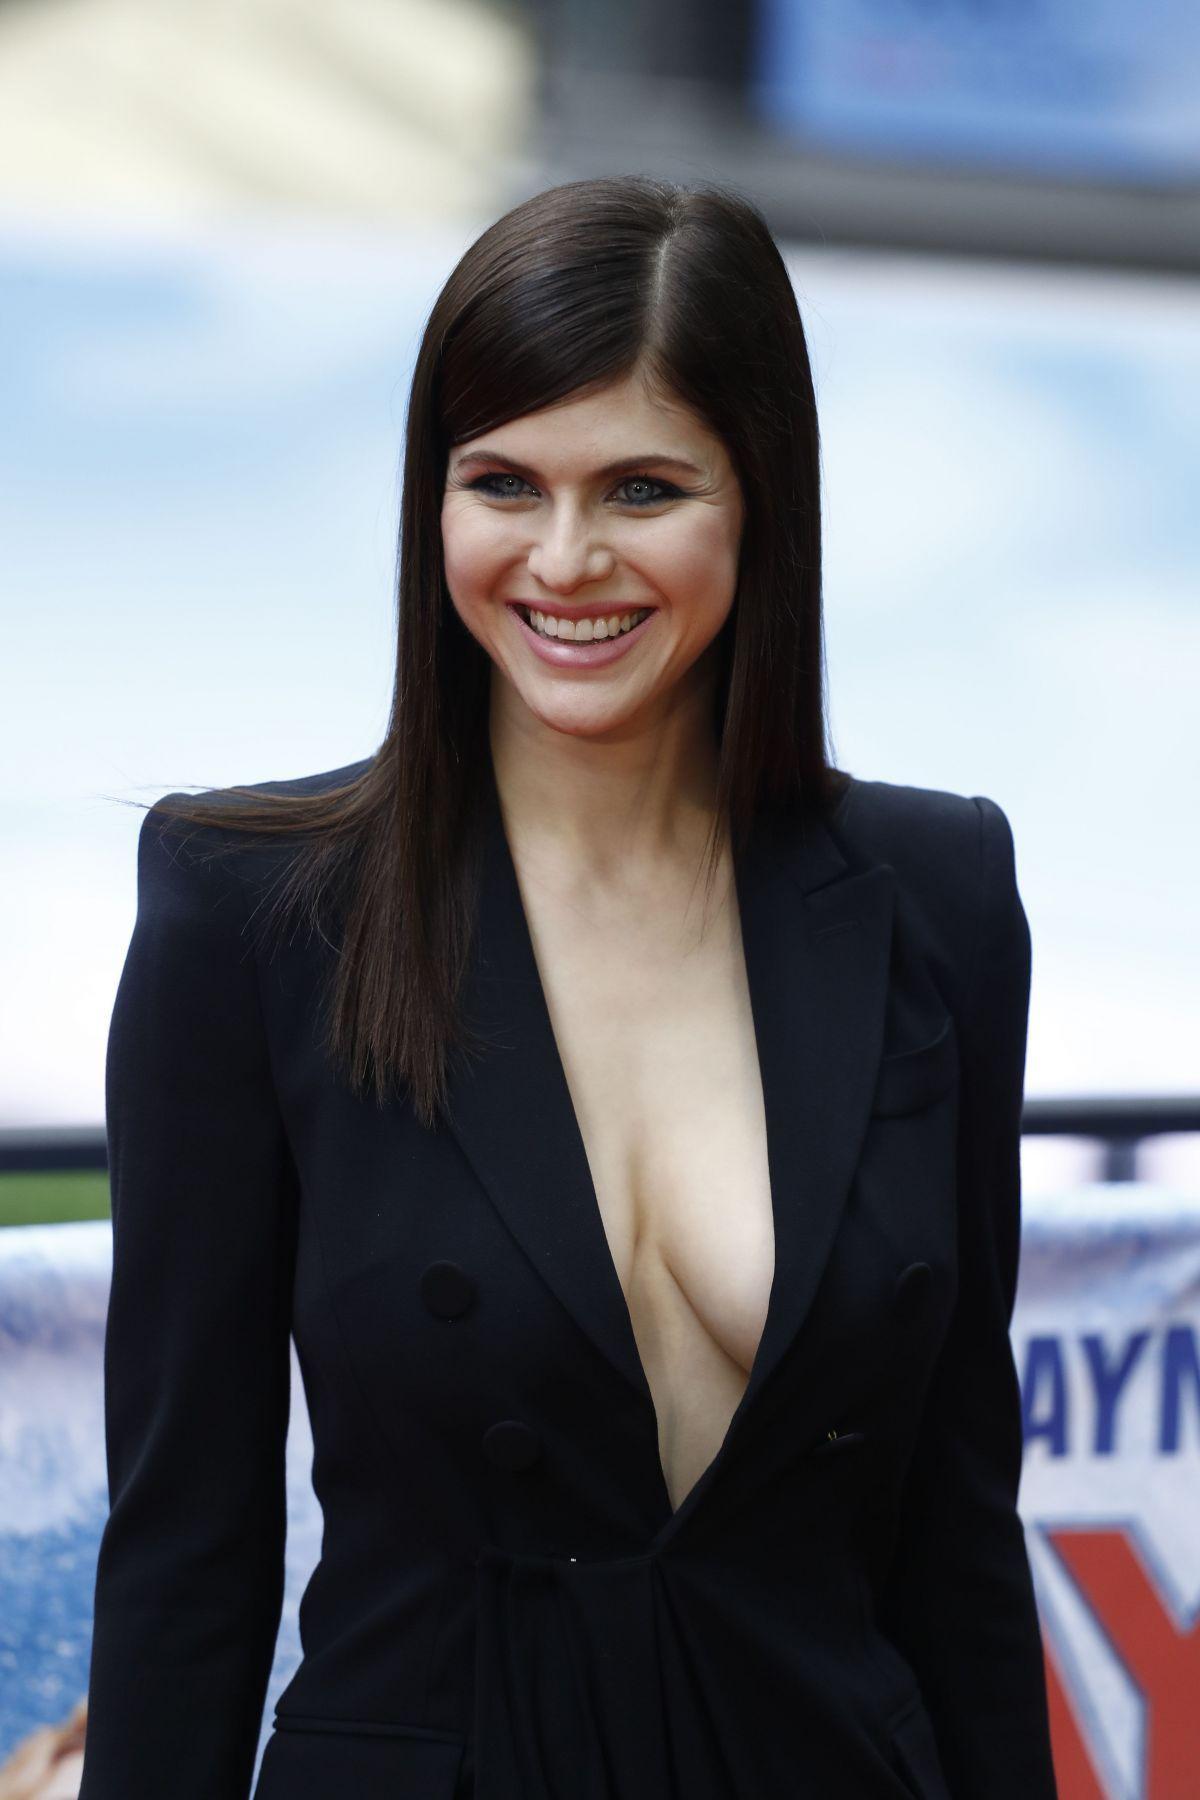 CLAP! TV Actress Alexandra Daddario Naked • Page 3